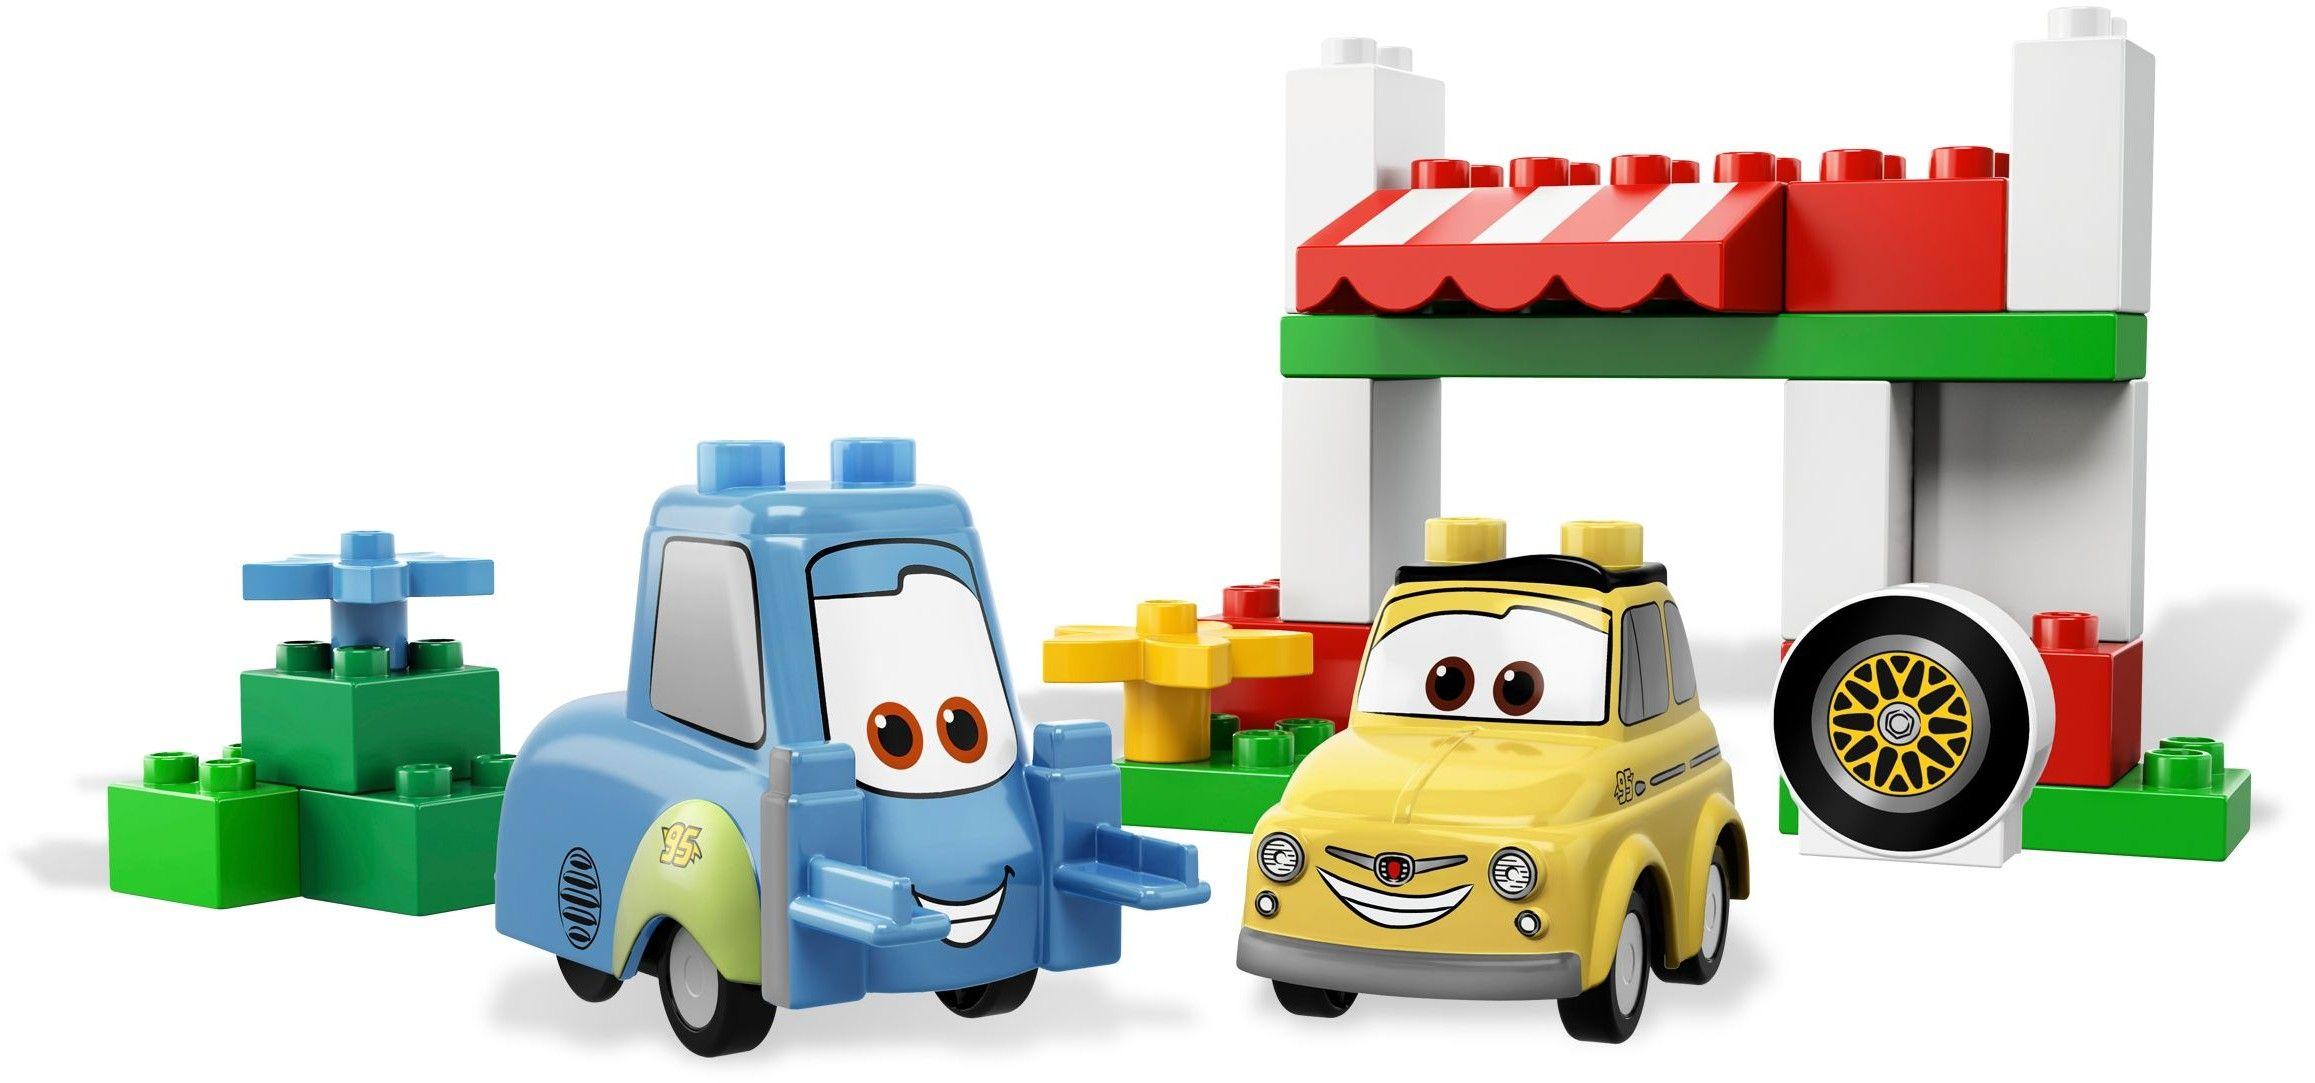 58181 Luigi's Italian Place Lego duplo, Lego duplo